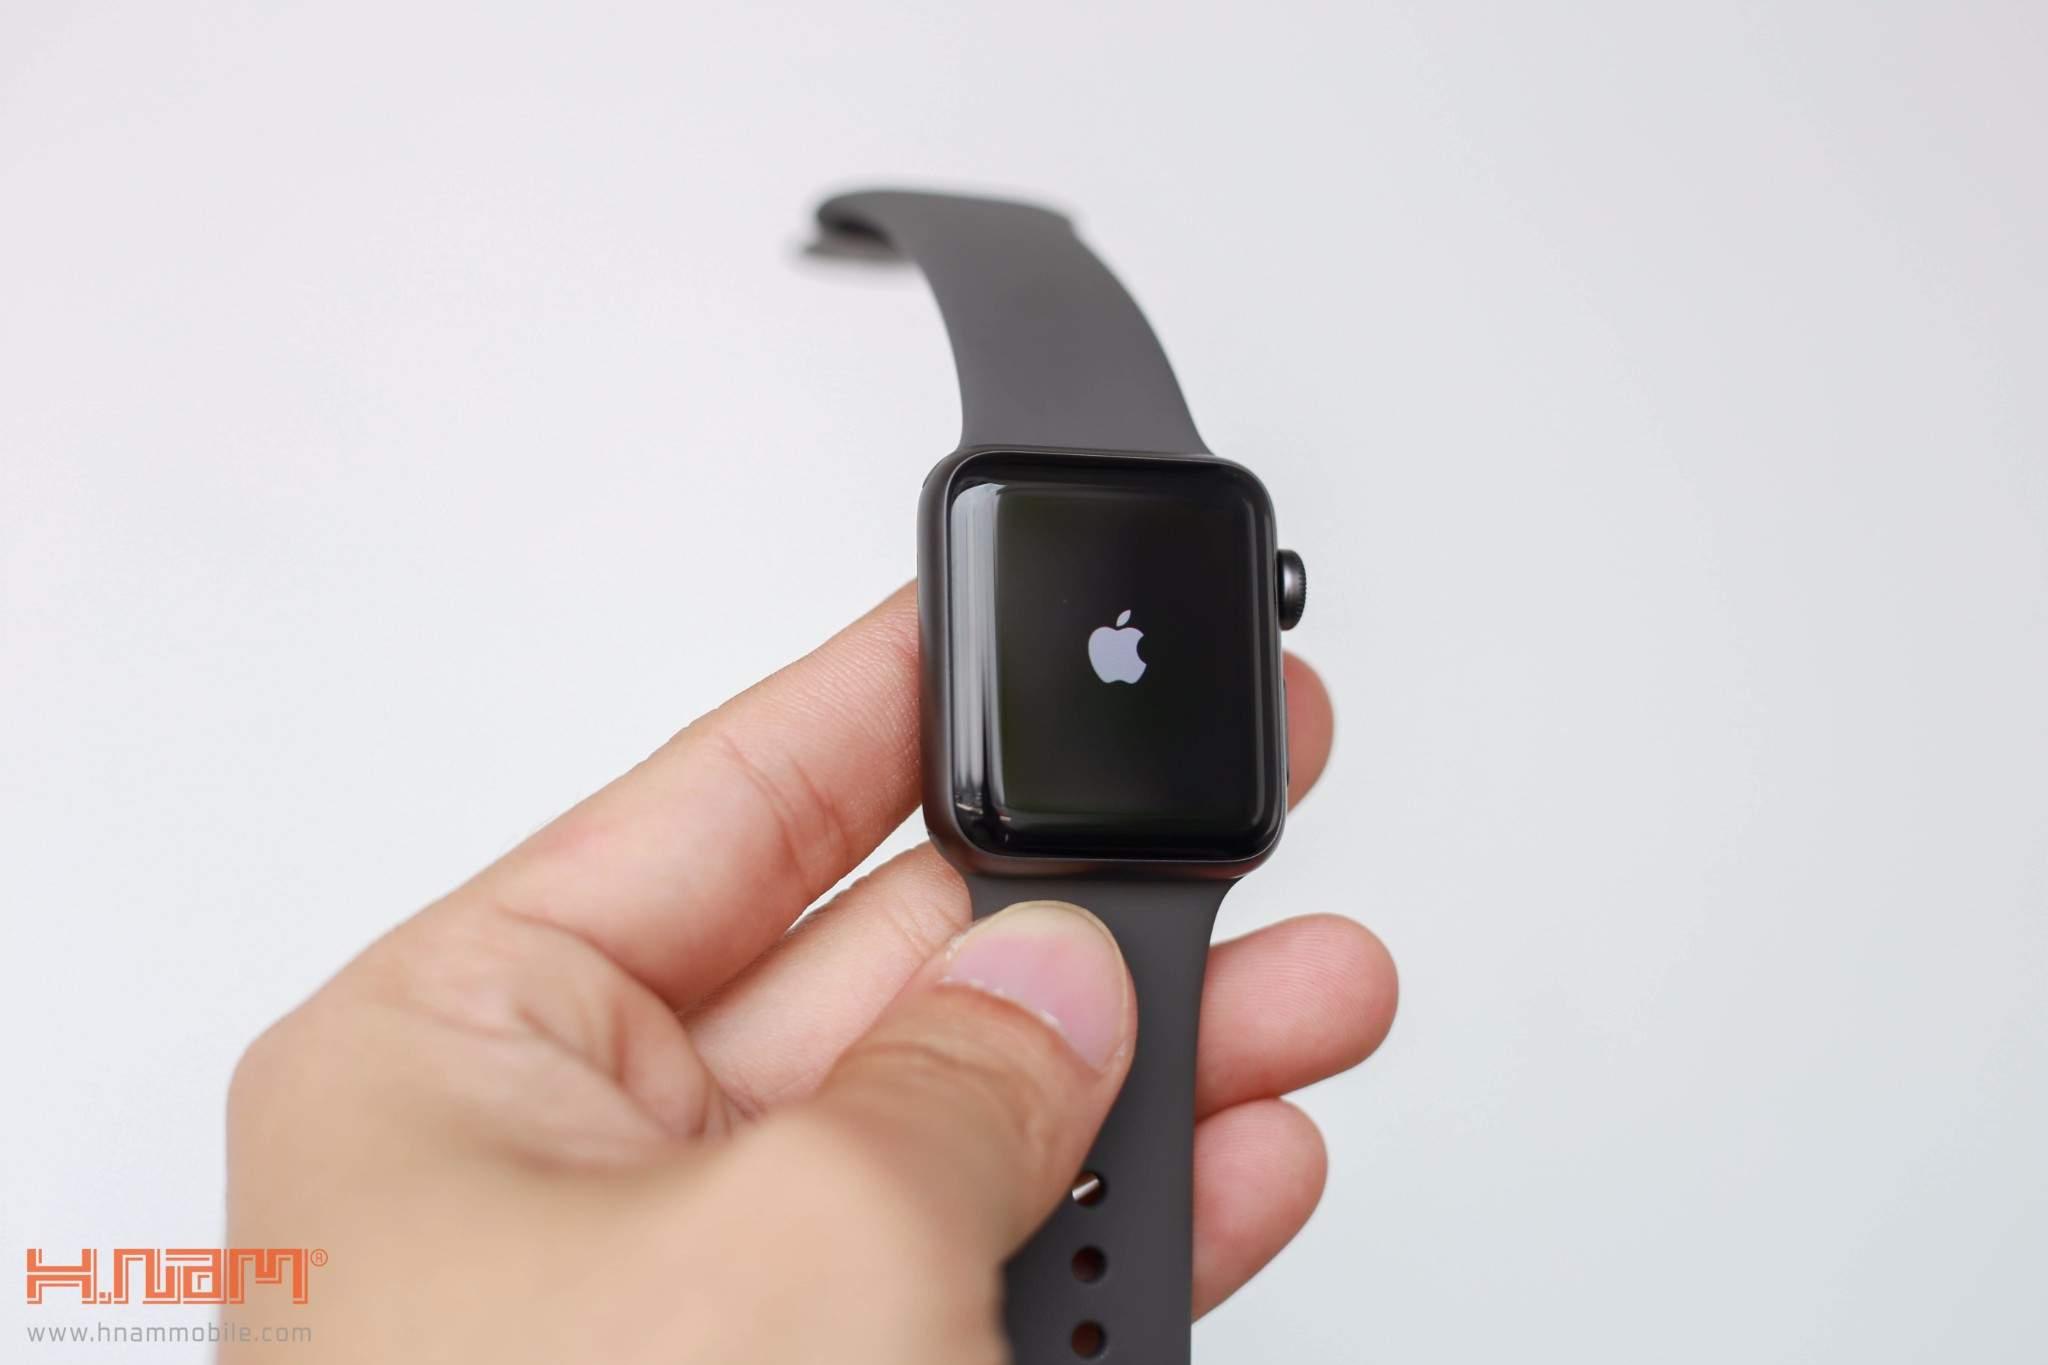 Apple Watch Series 3 38mm Gold Aluminum Case-MQKW2 hình sản phẩm 0